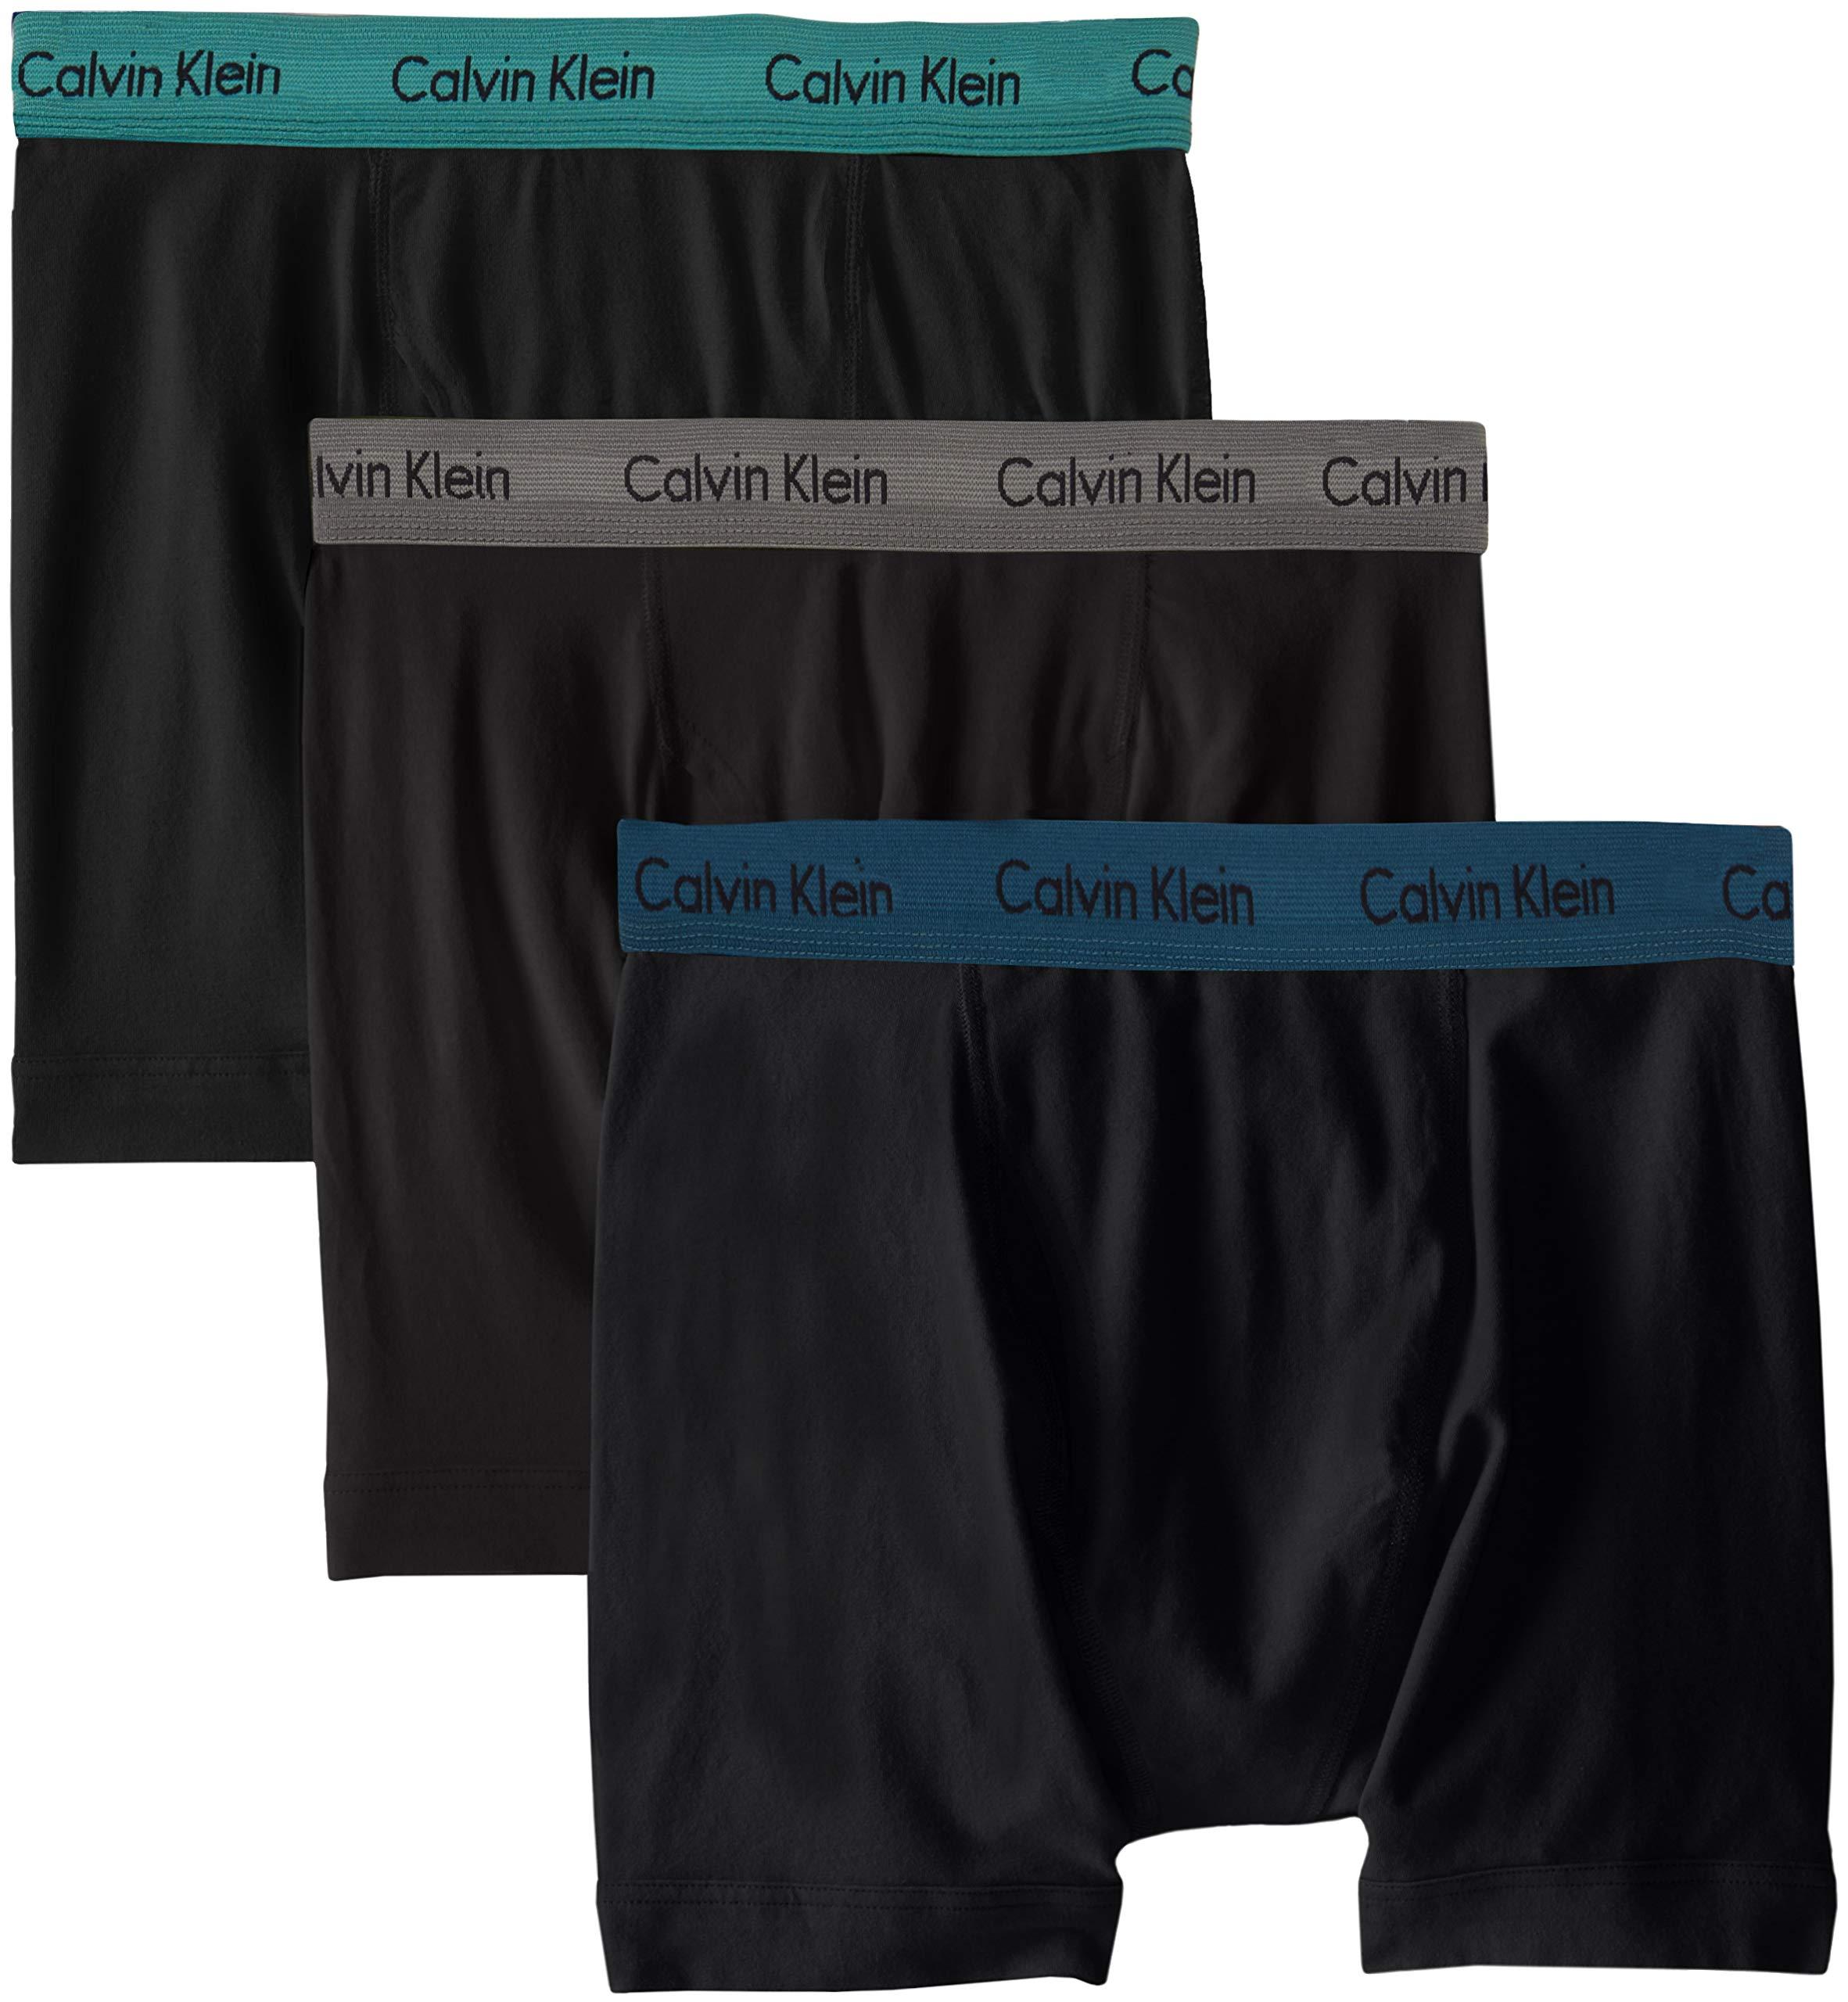 Calvin Klein Men's Cotton Stretch Boxer Briefs, Black/Grey Sky/Majolica/Raleigh (3 Pack) X-Large